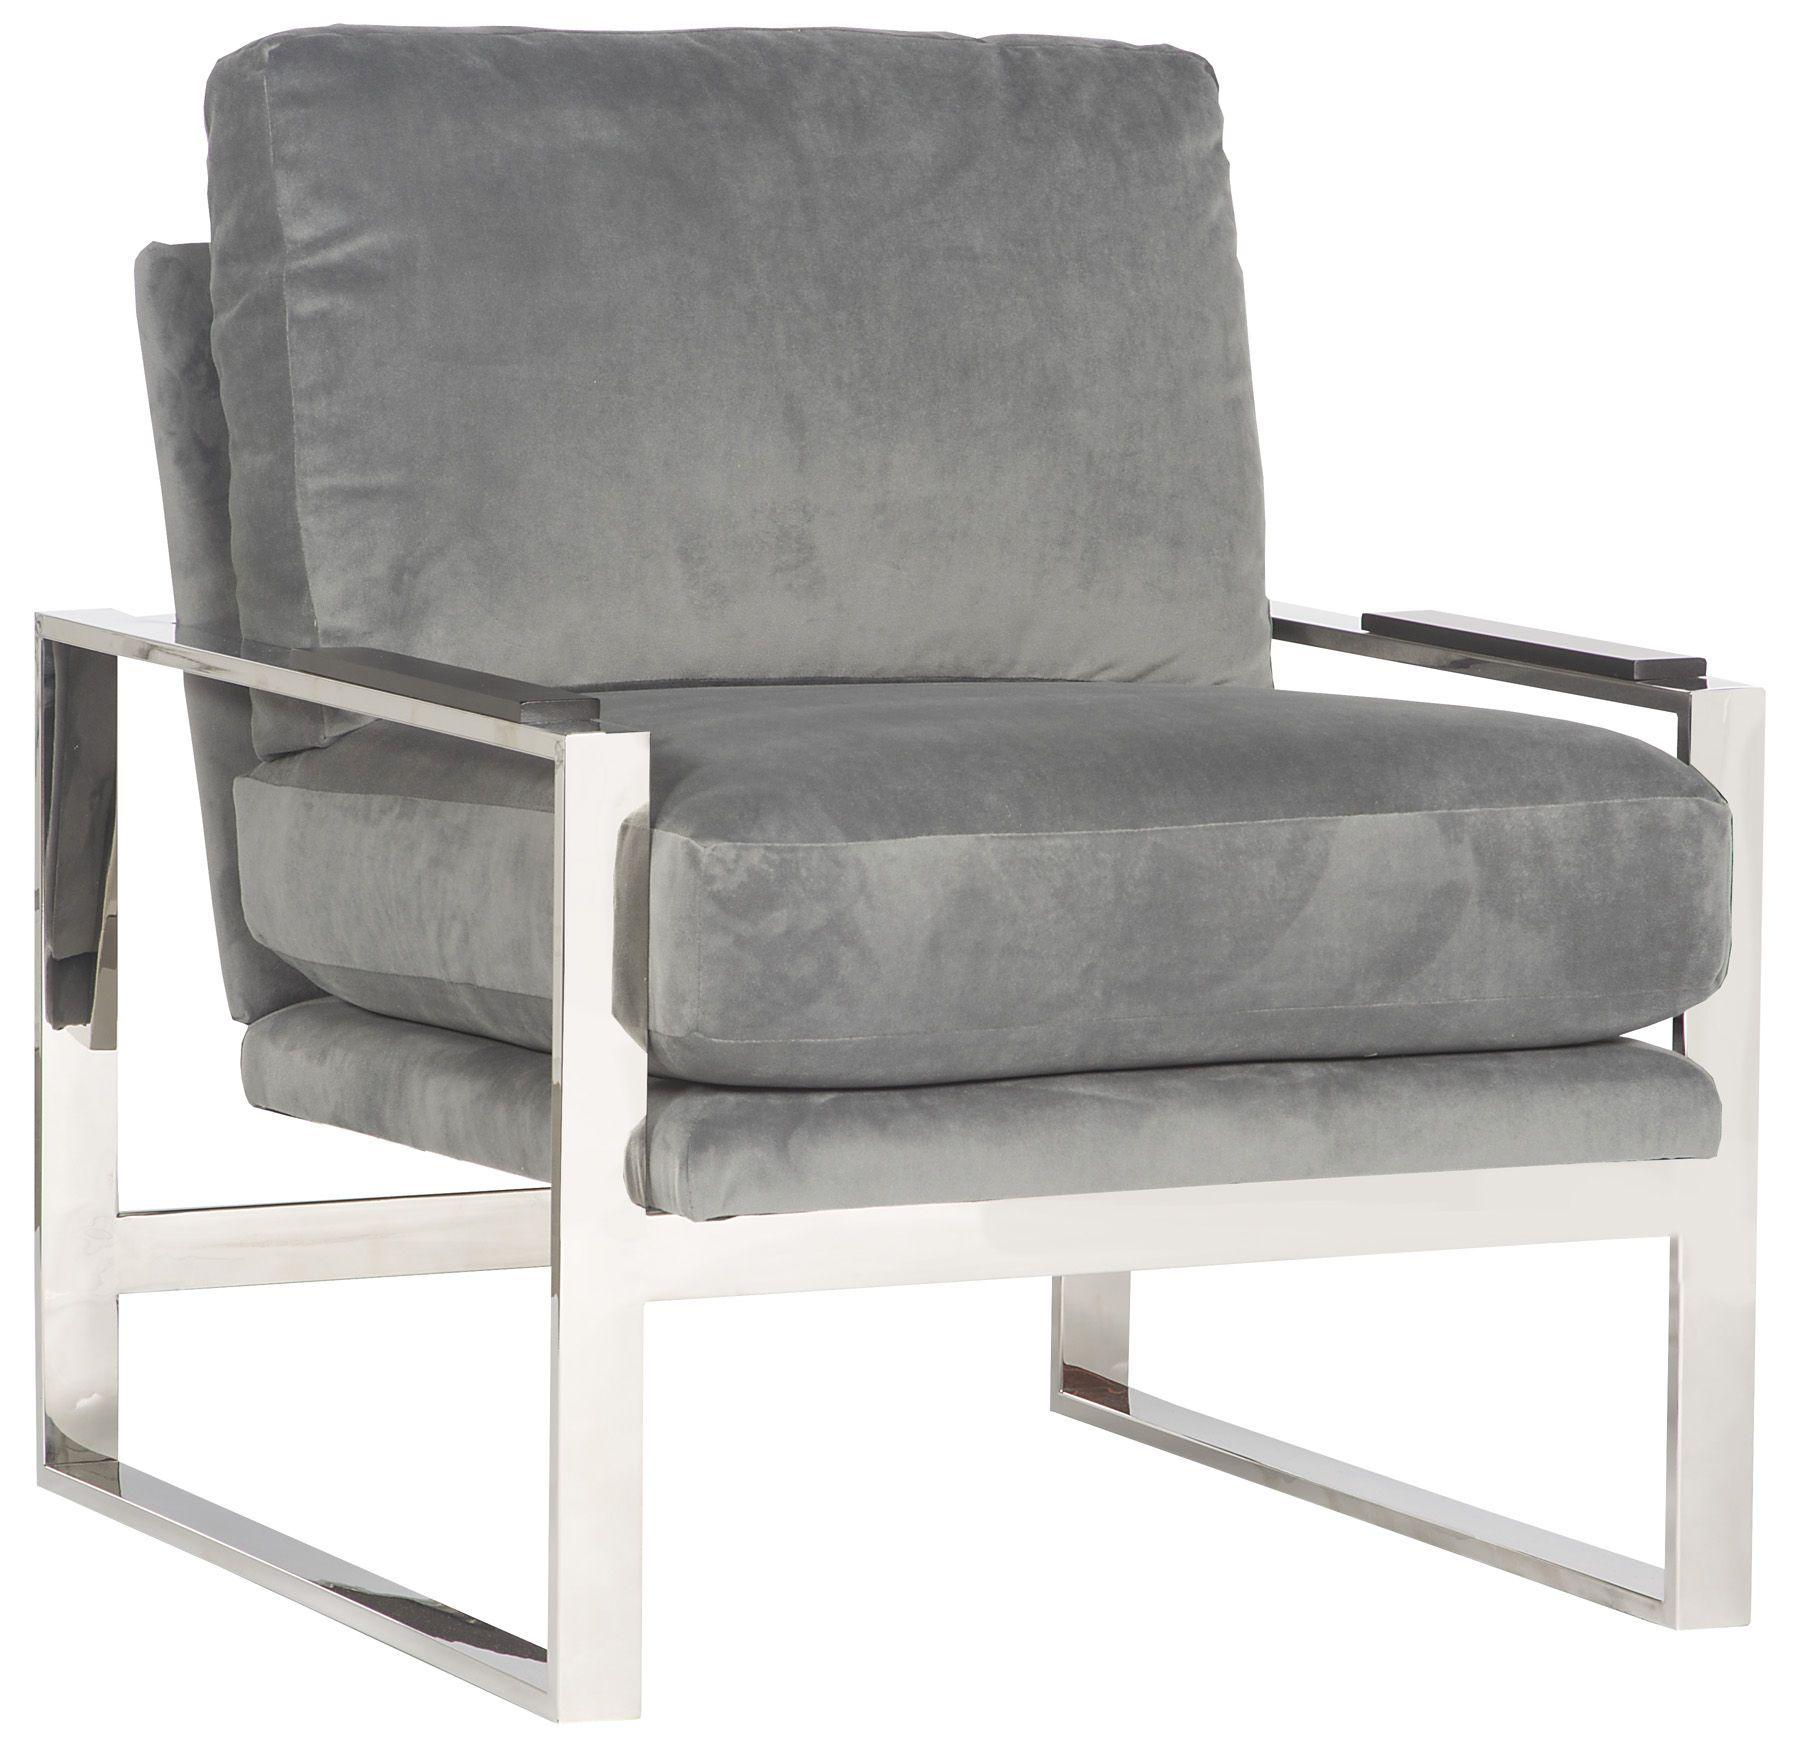 Vanguard Living Room Chair W104 CH   Vanguard Furniture   Conover, NC